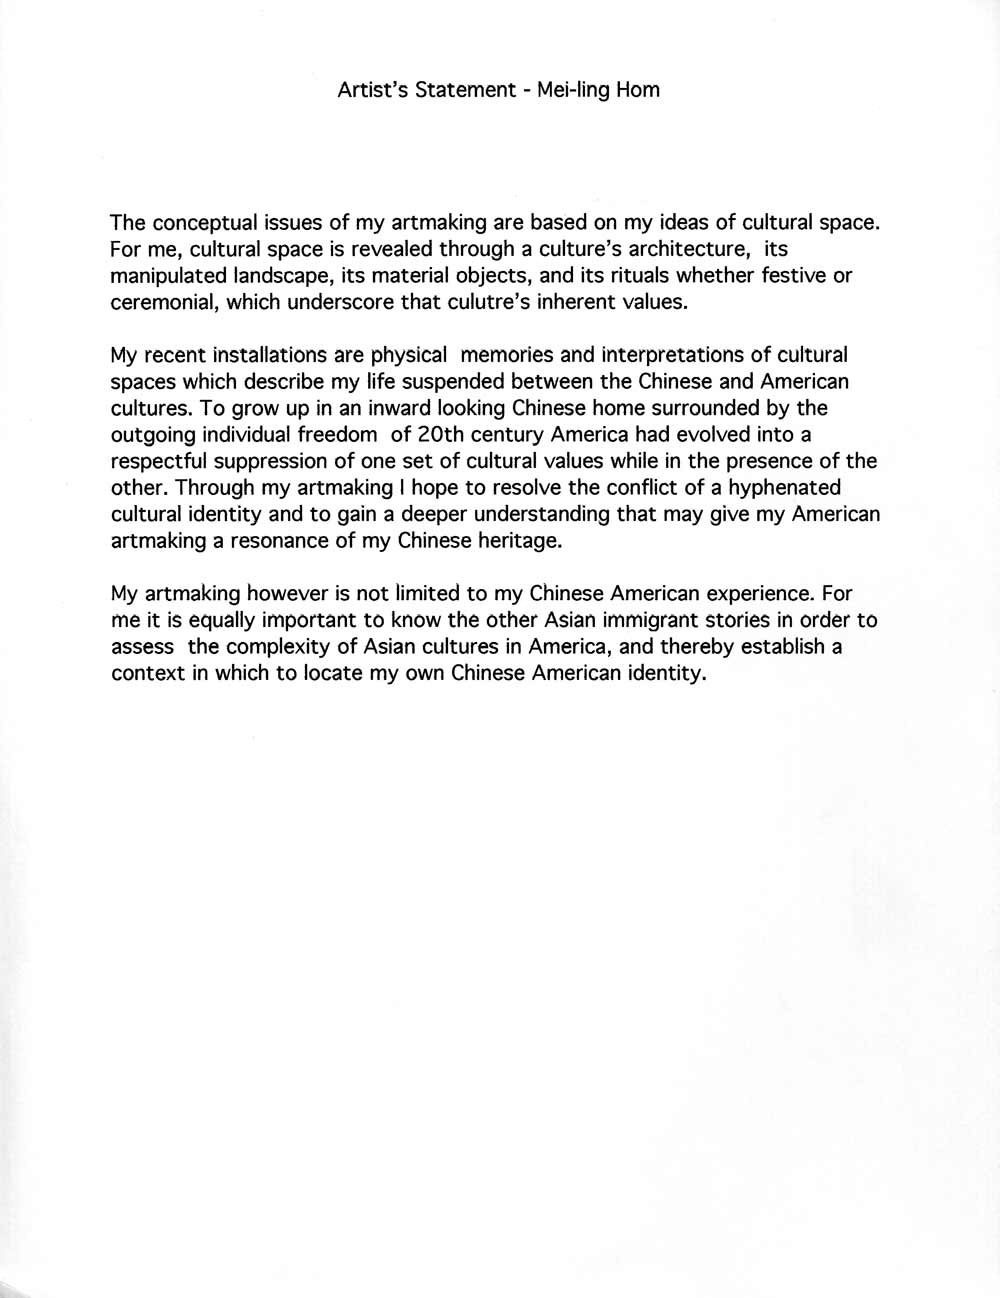 Mei Ling Hom's Artist Statement